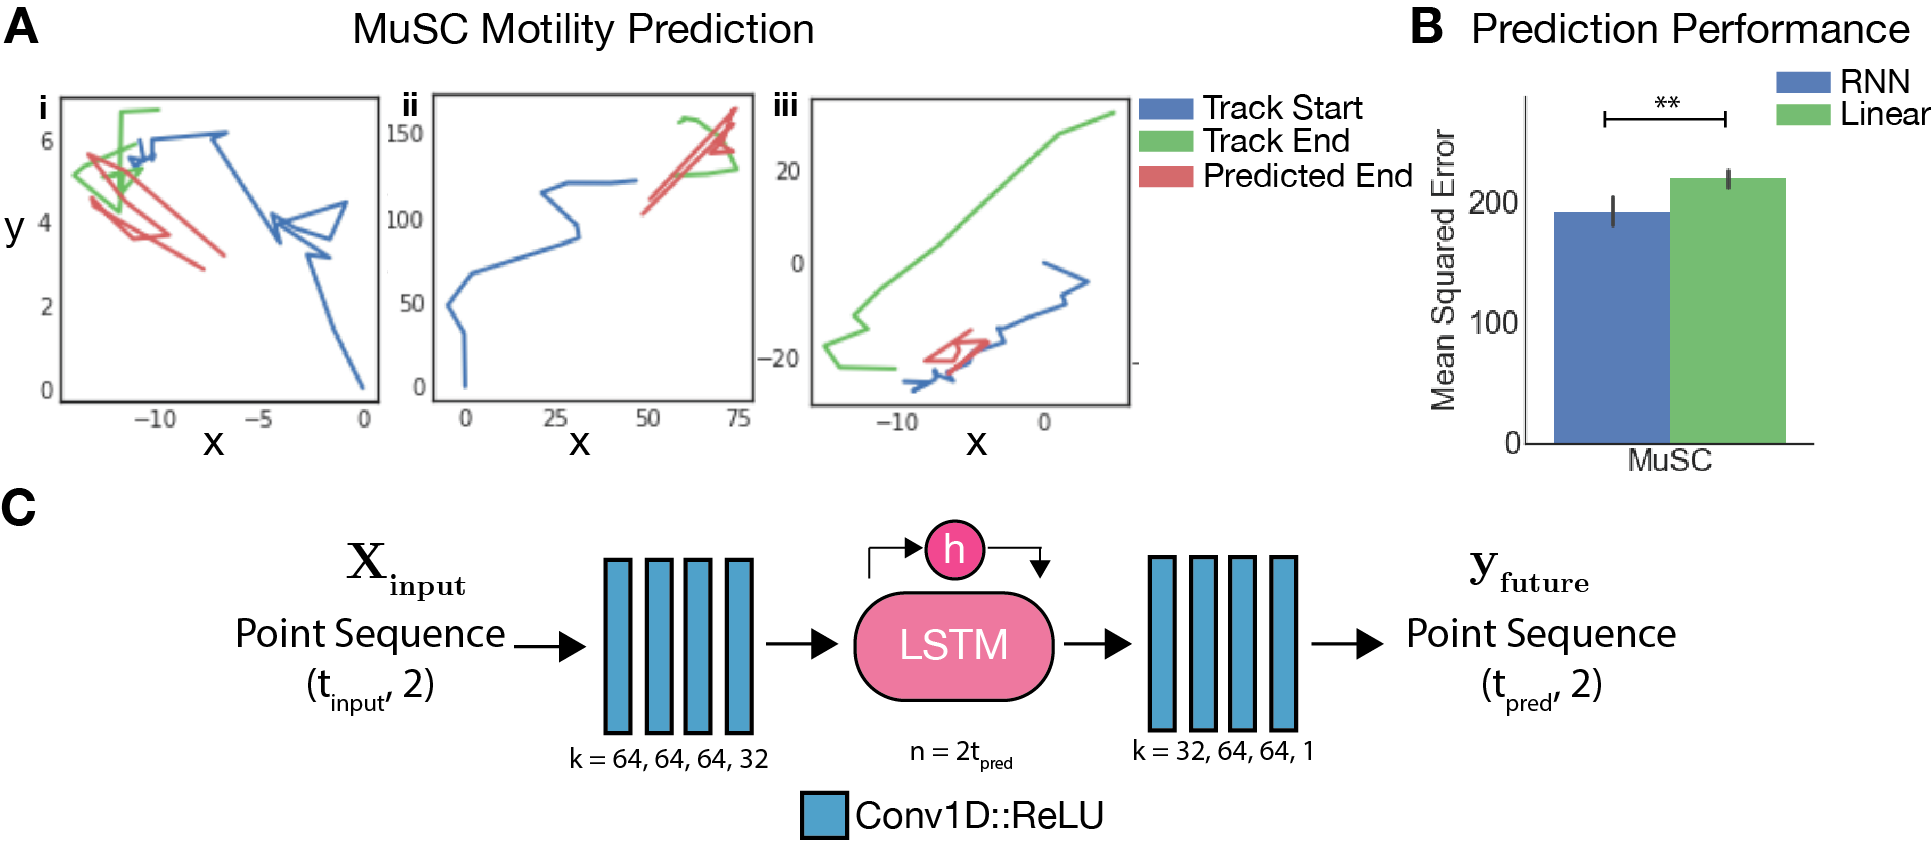 Cell motility prediction RNNs.